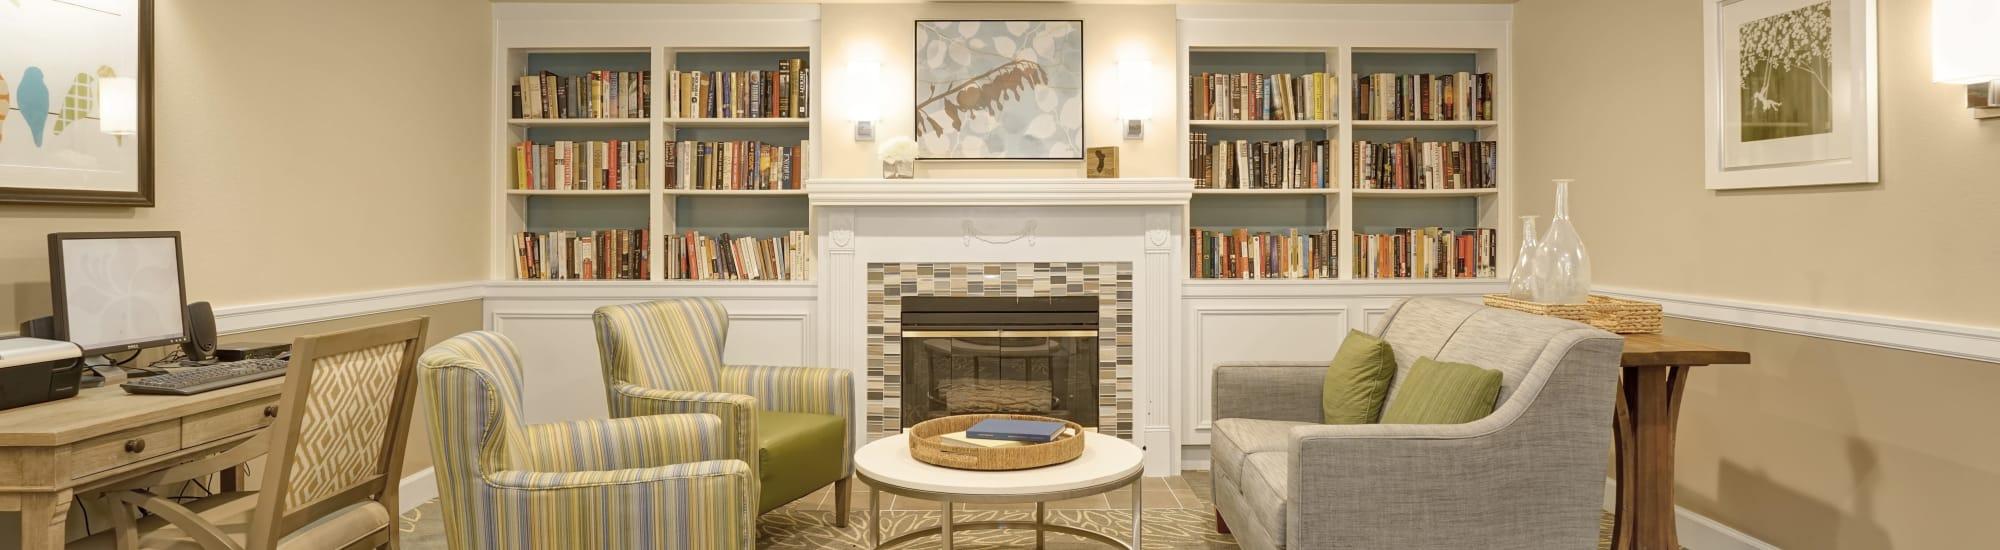 Reviews & testimonials at Island House Assisted Living in Mercer Island, Washington